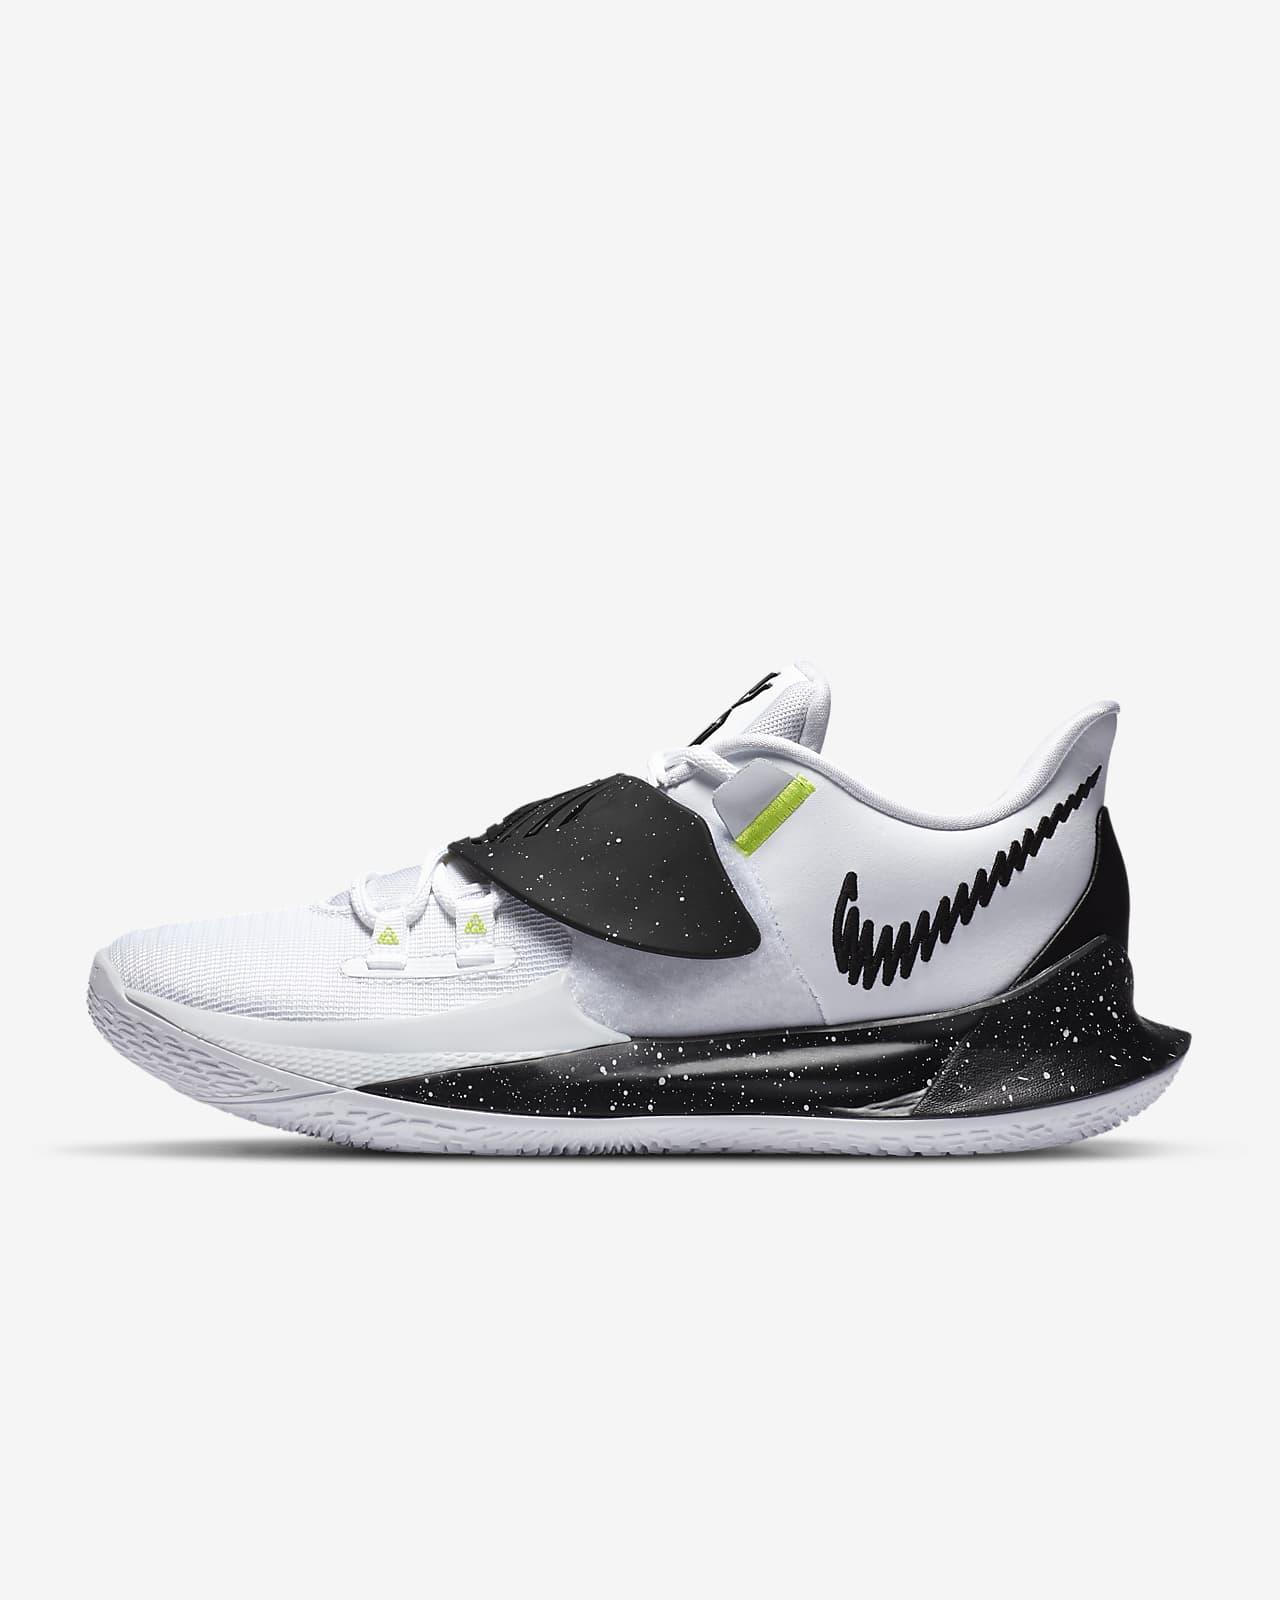 Kyrie Low 3 (Team) Basketball Shoe